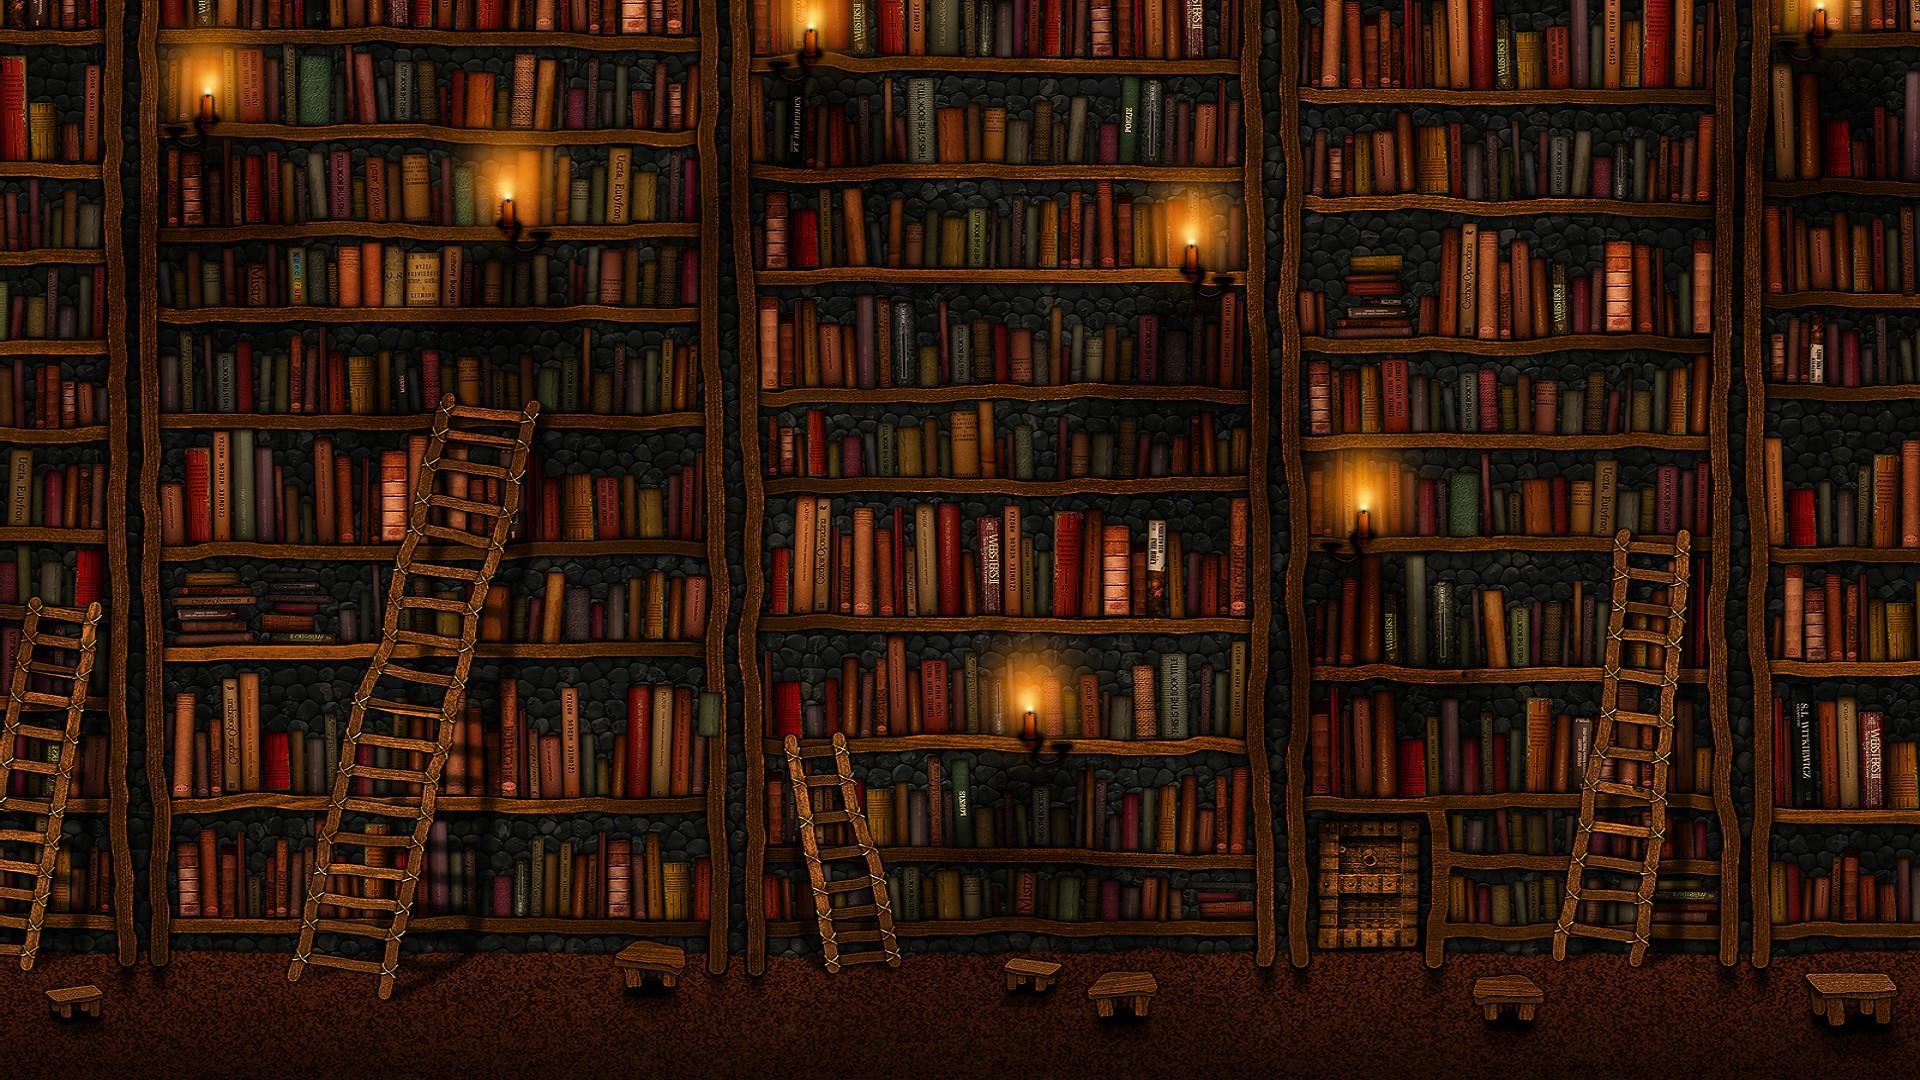 Библиотека книги библиотека